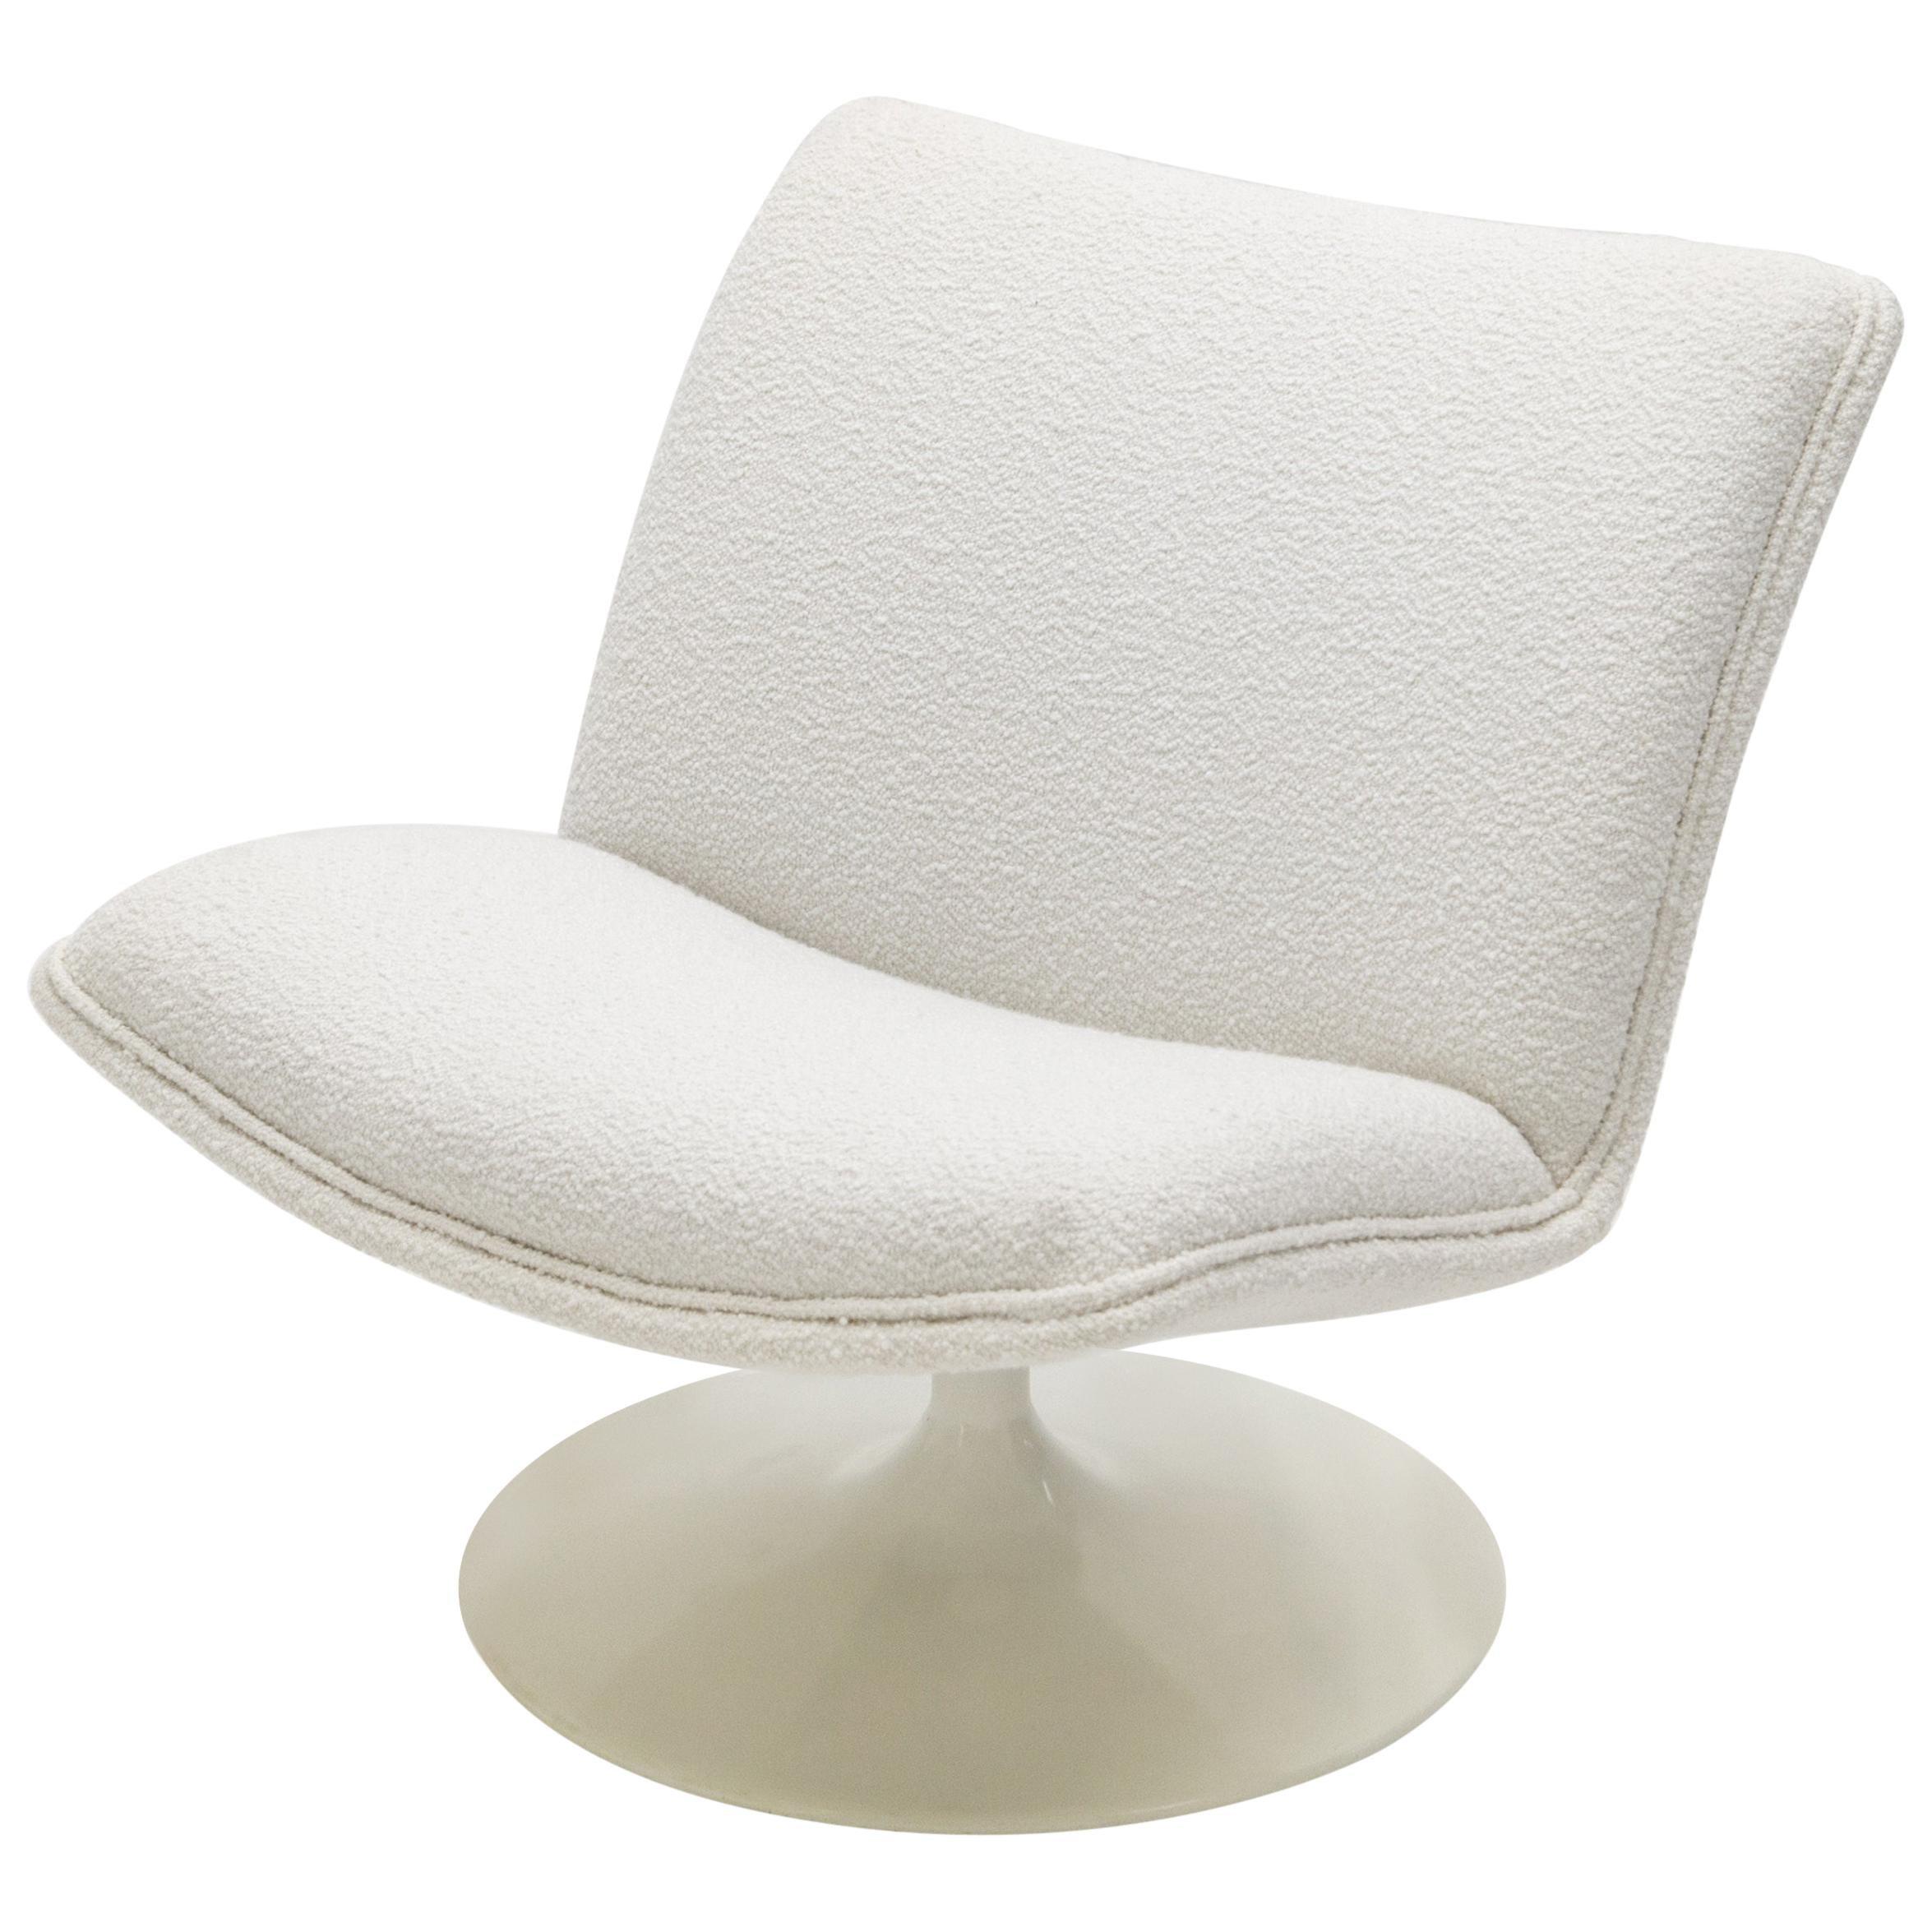 Geoffrey Harcourt for Artifort F504 Swivel Lounge Chair Bouclé, 1960s